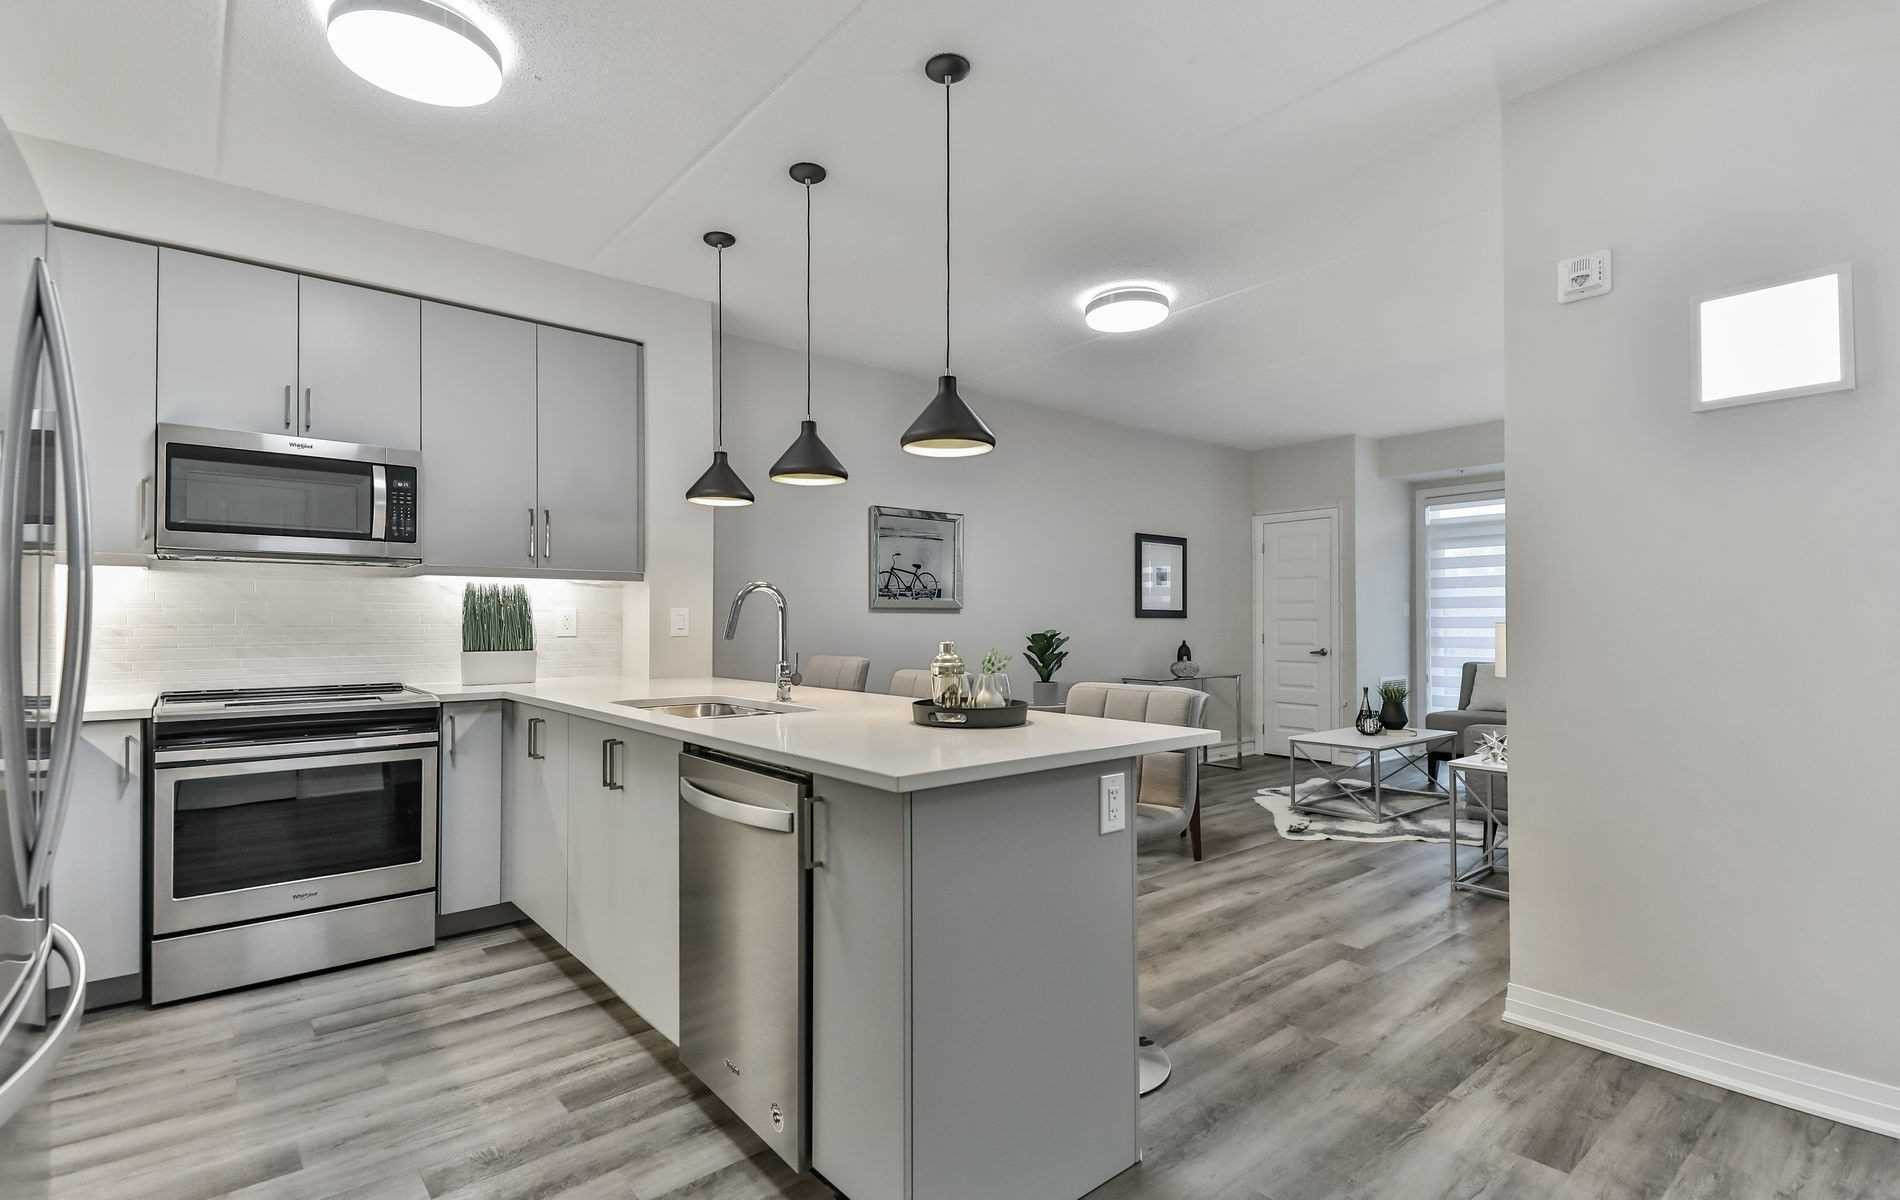 316 - 610 Farmstead Dr - Willmont Condo Apt for sale, 2 Bedrooms (W5399854) - #6